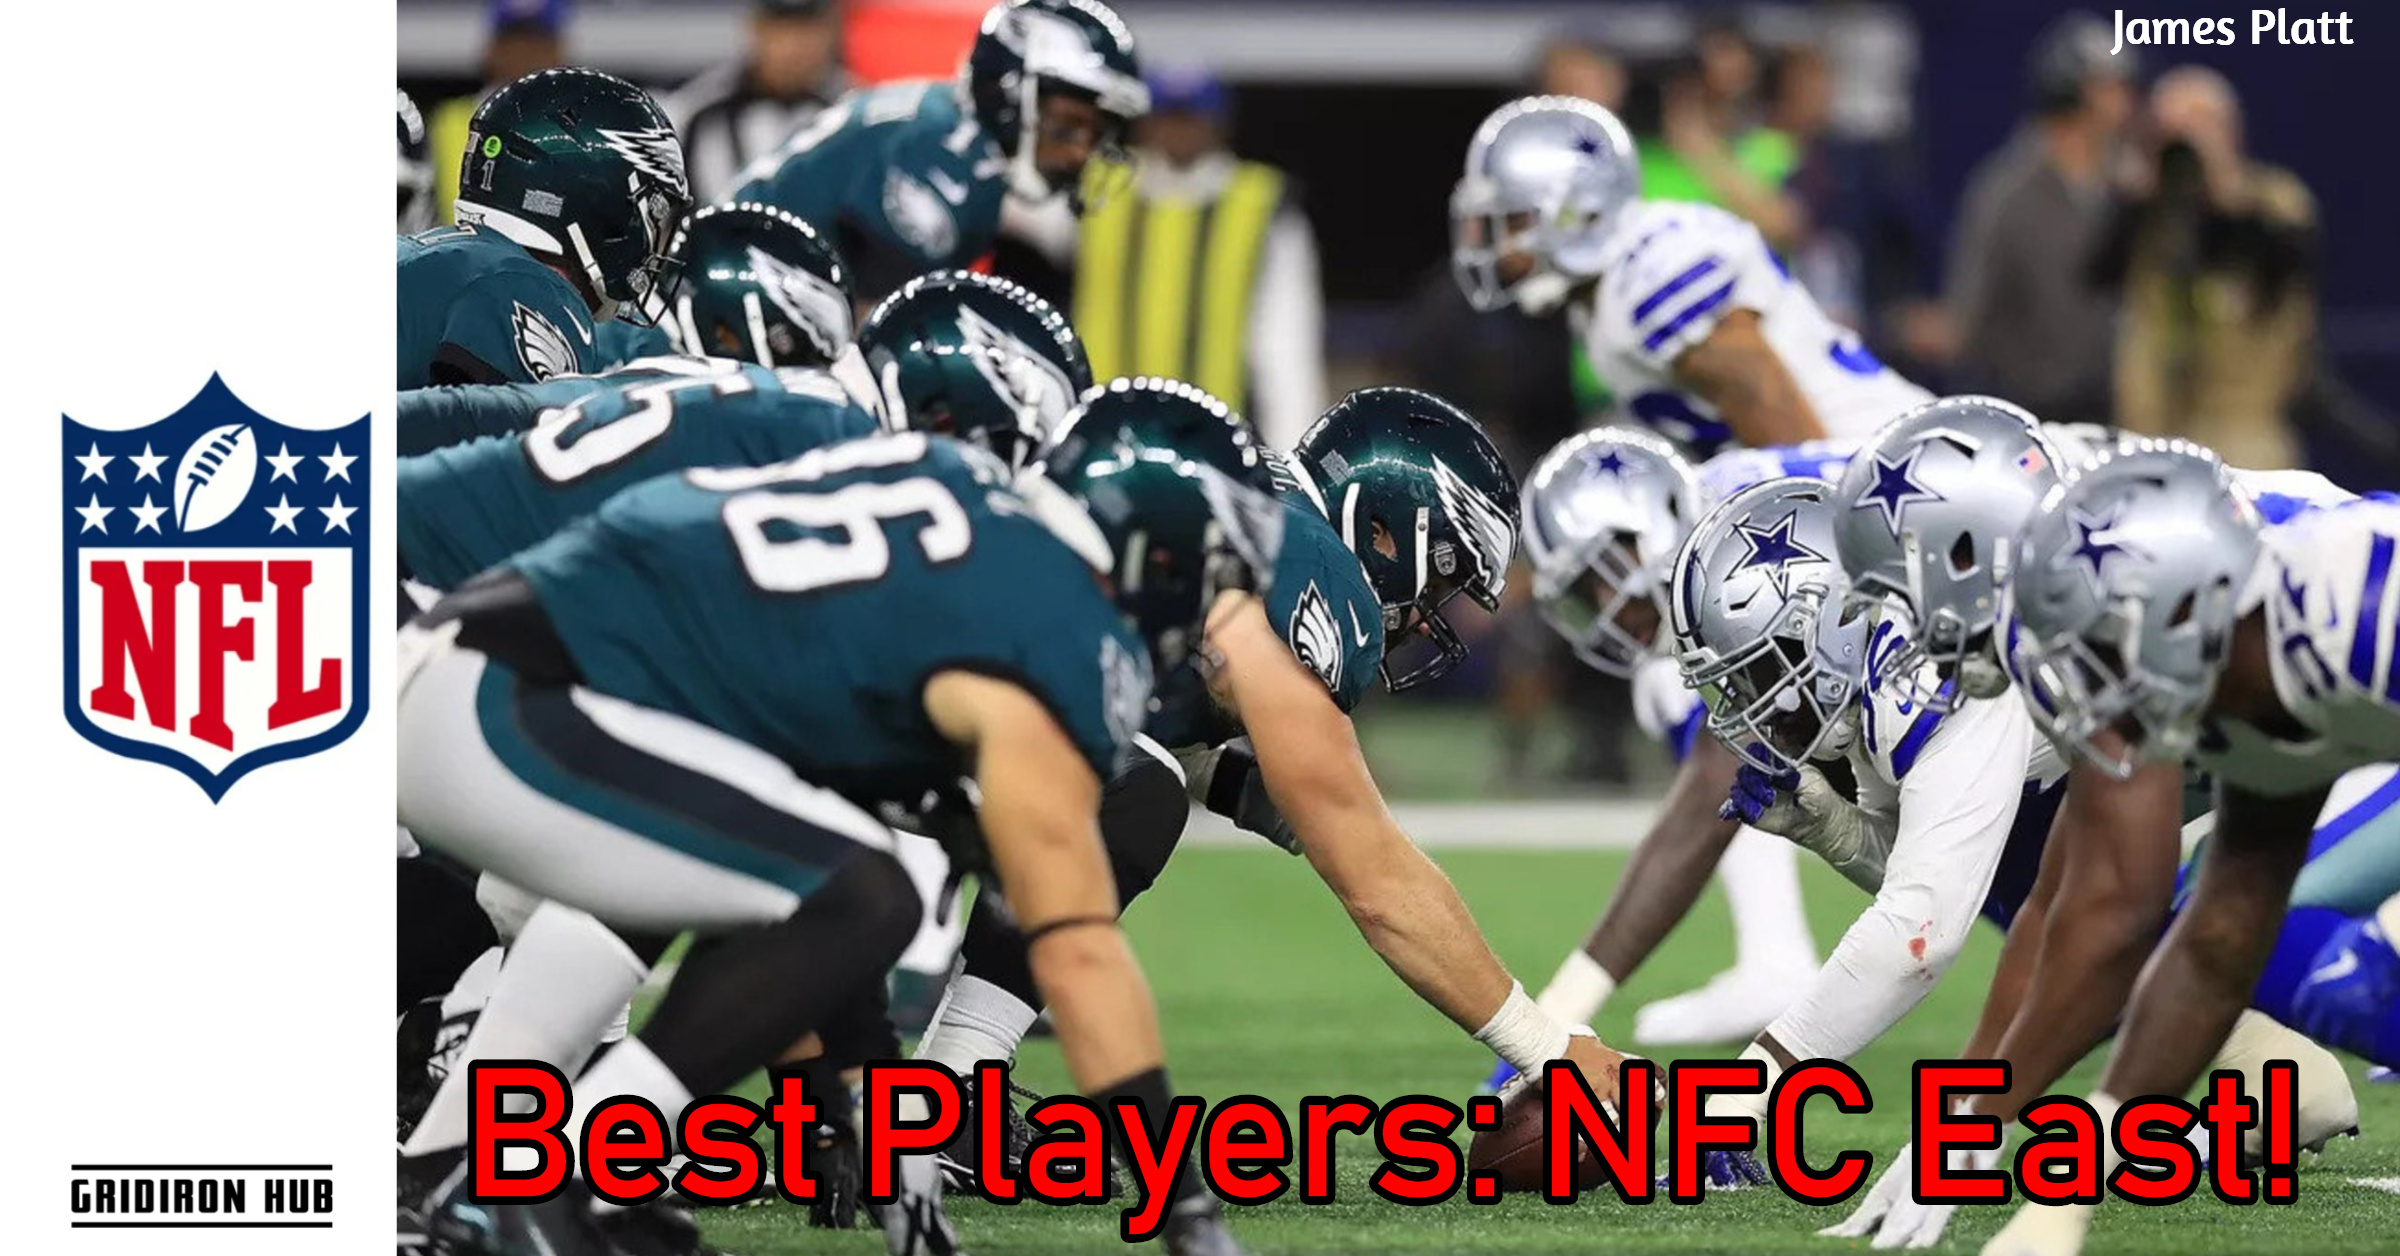 Top 40 NFL Quarterbacks for the 2020 Season! - Gridiron Hub